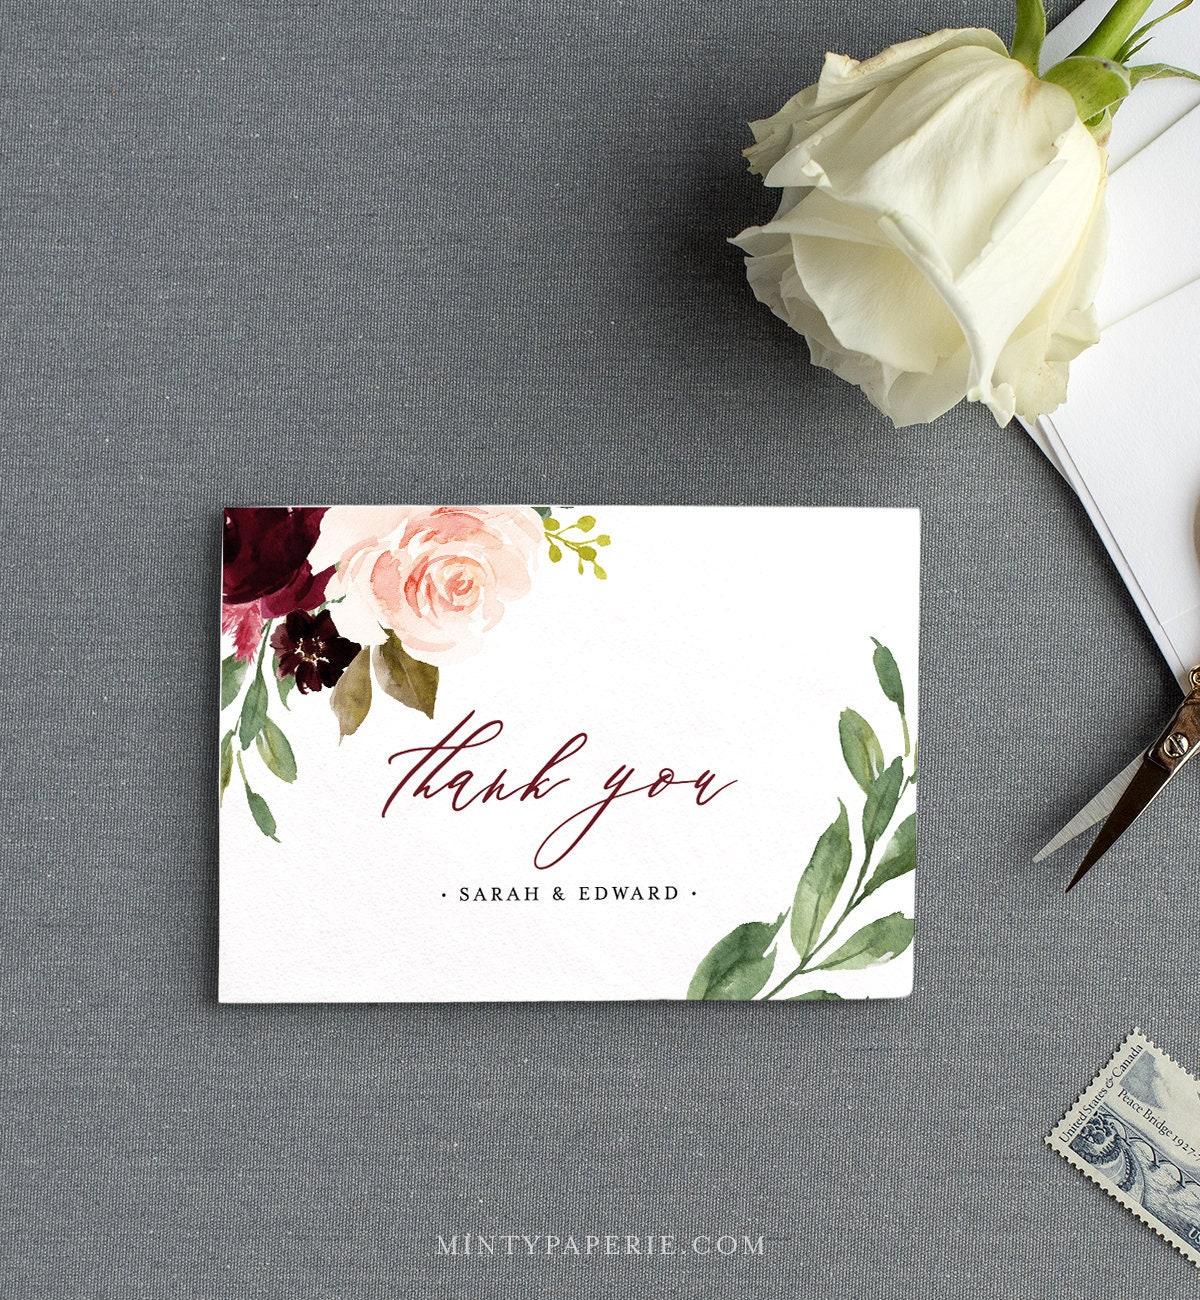 F5 DIY 100/% Editable Text Templett Boho Wedding INSTANT DOWNLOAD Printable Blush floral Folded Card Wedding Thank You Card Template